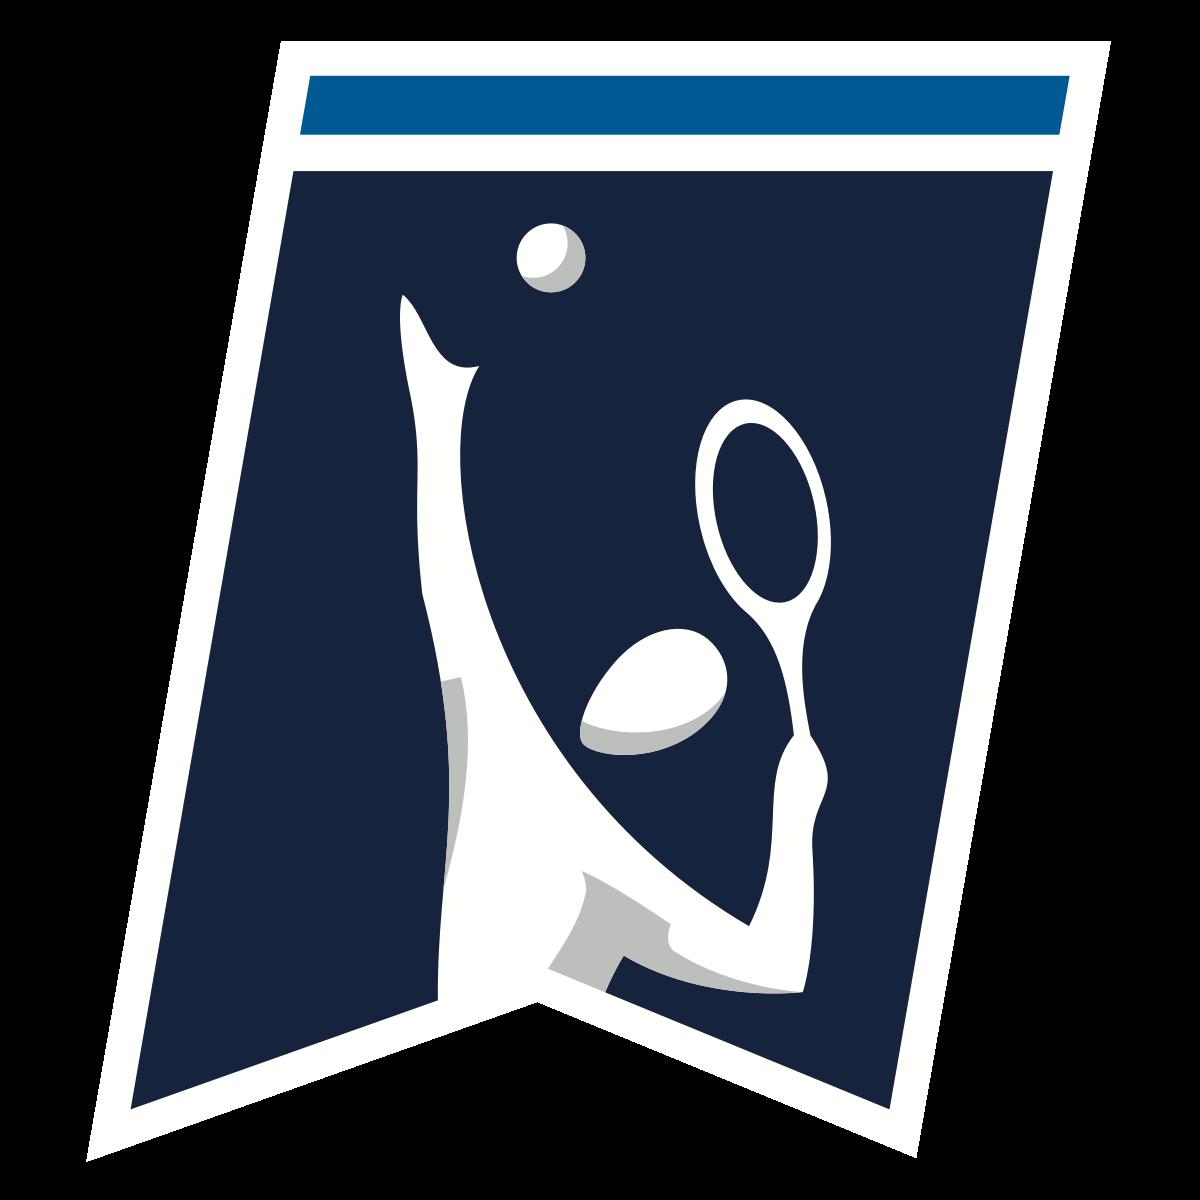 2018 DIII Men's Tennis Championship